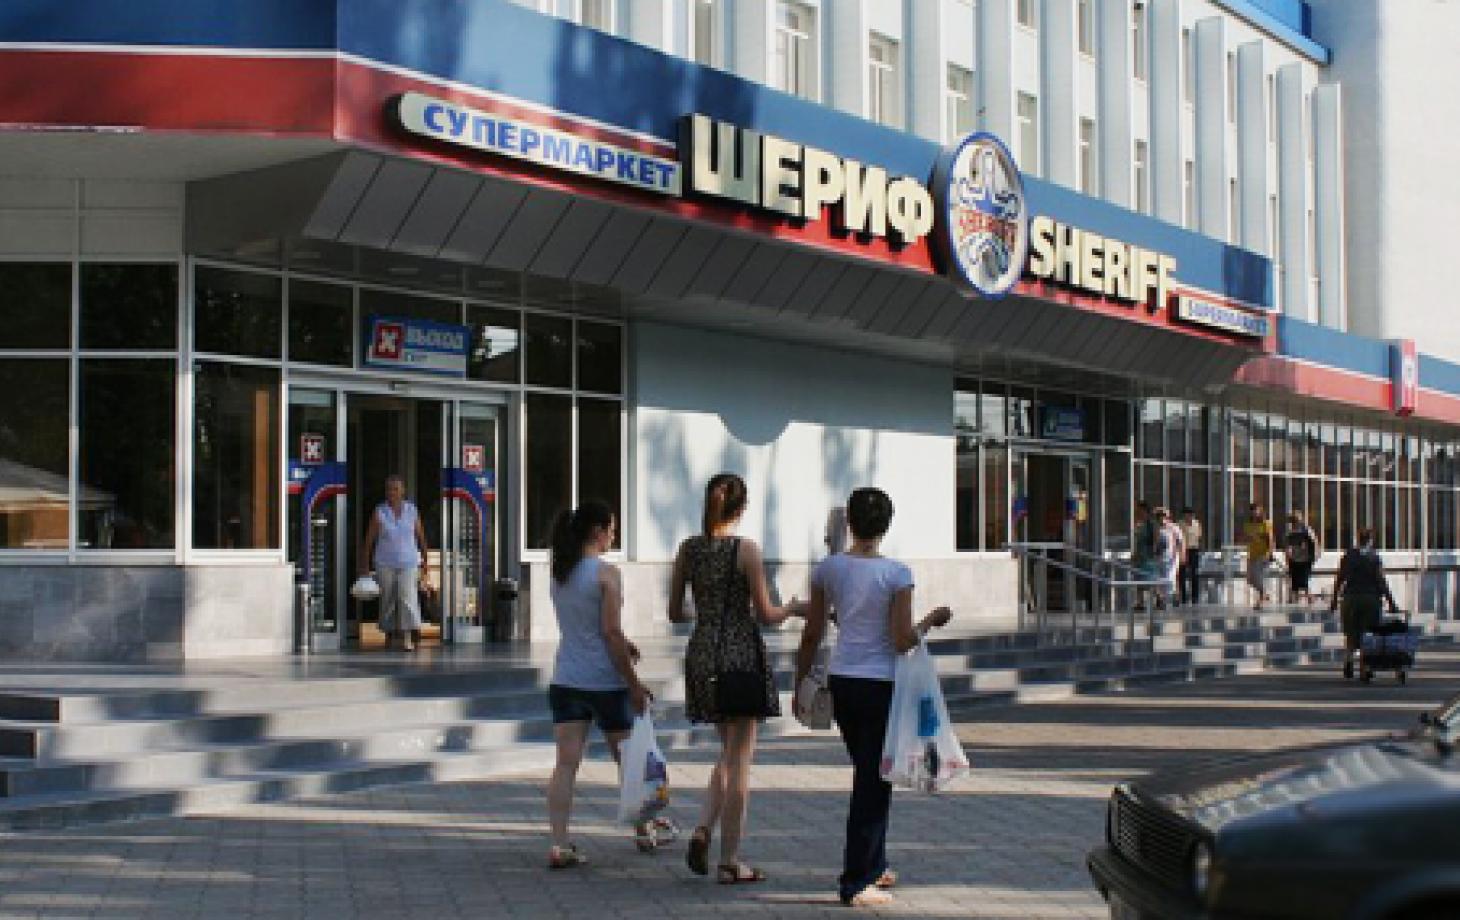 Республика Шериф  Как развивался бизнес приднестровских олигархов ... 03a791b5b87